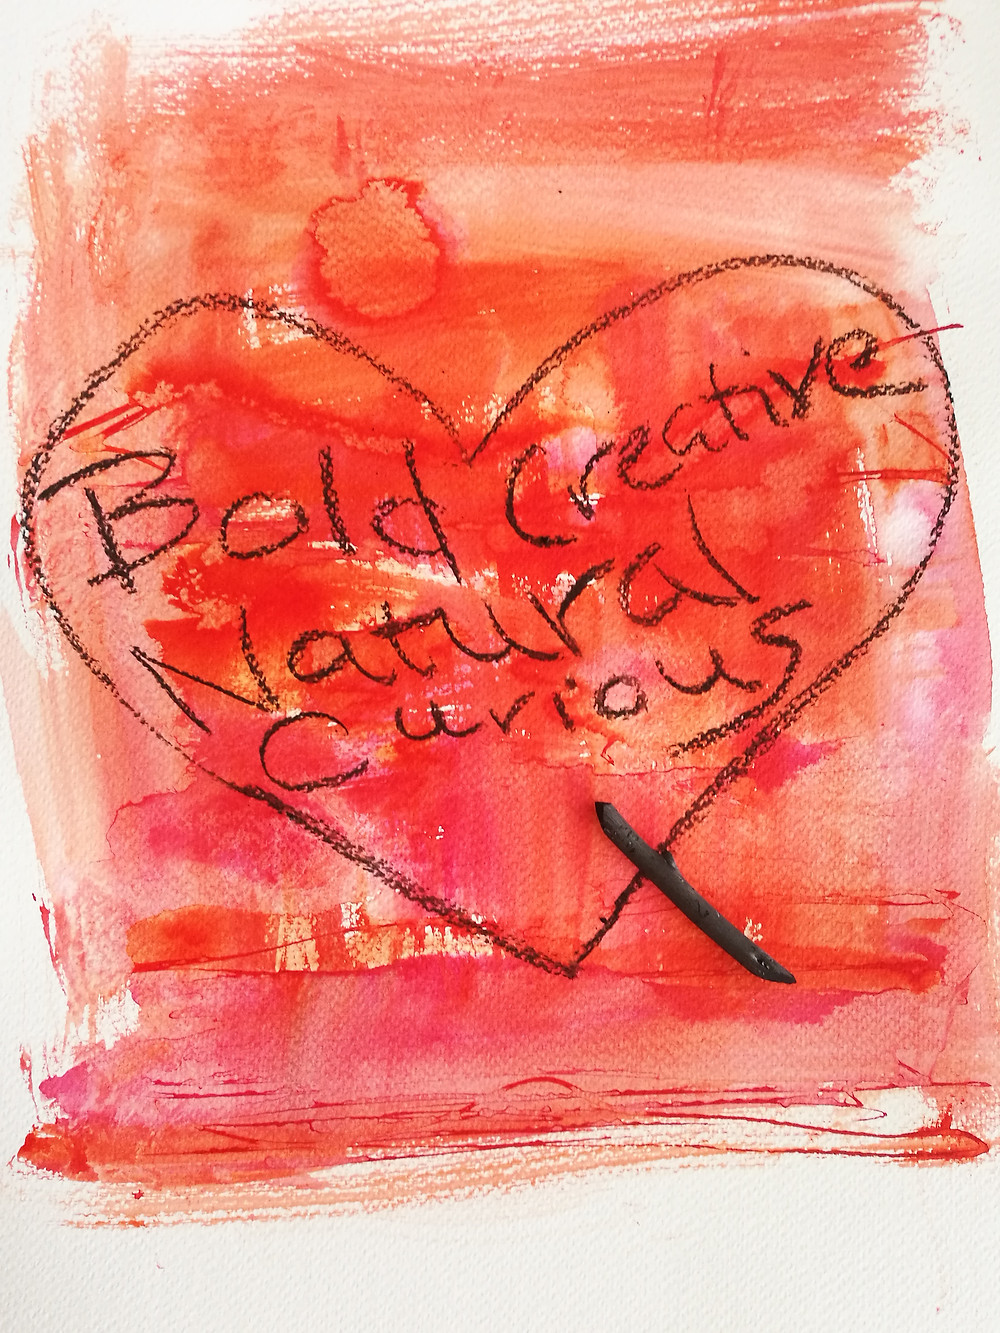 A sketch on creative selfcare